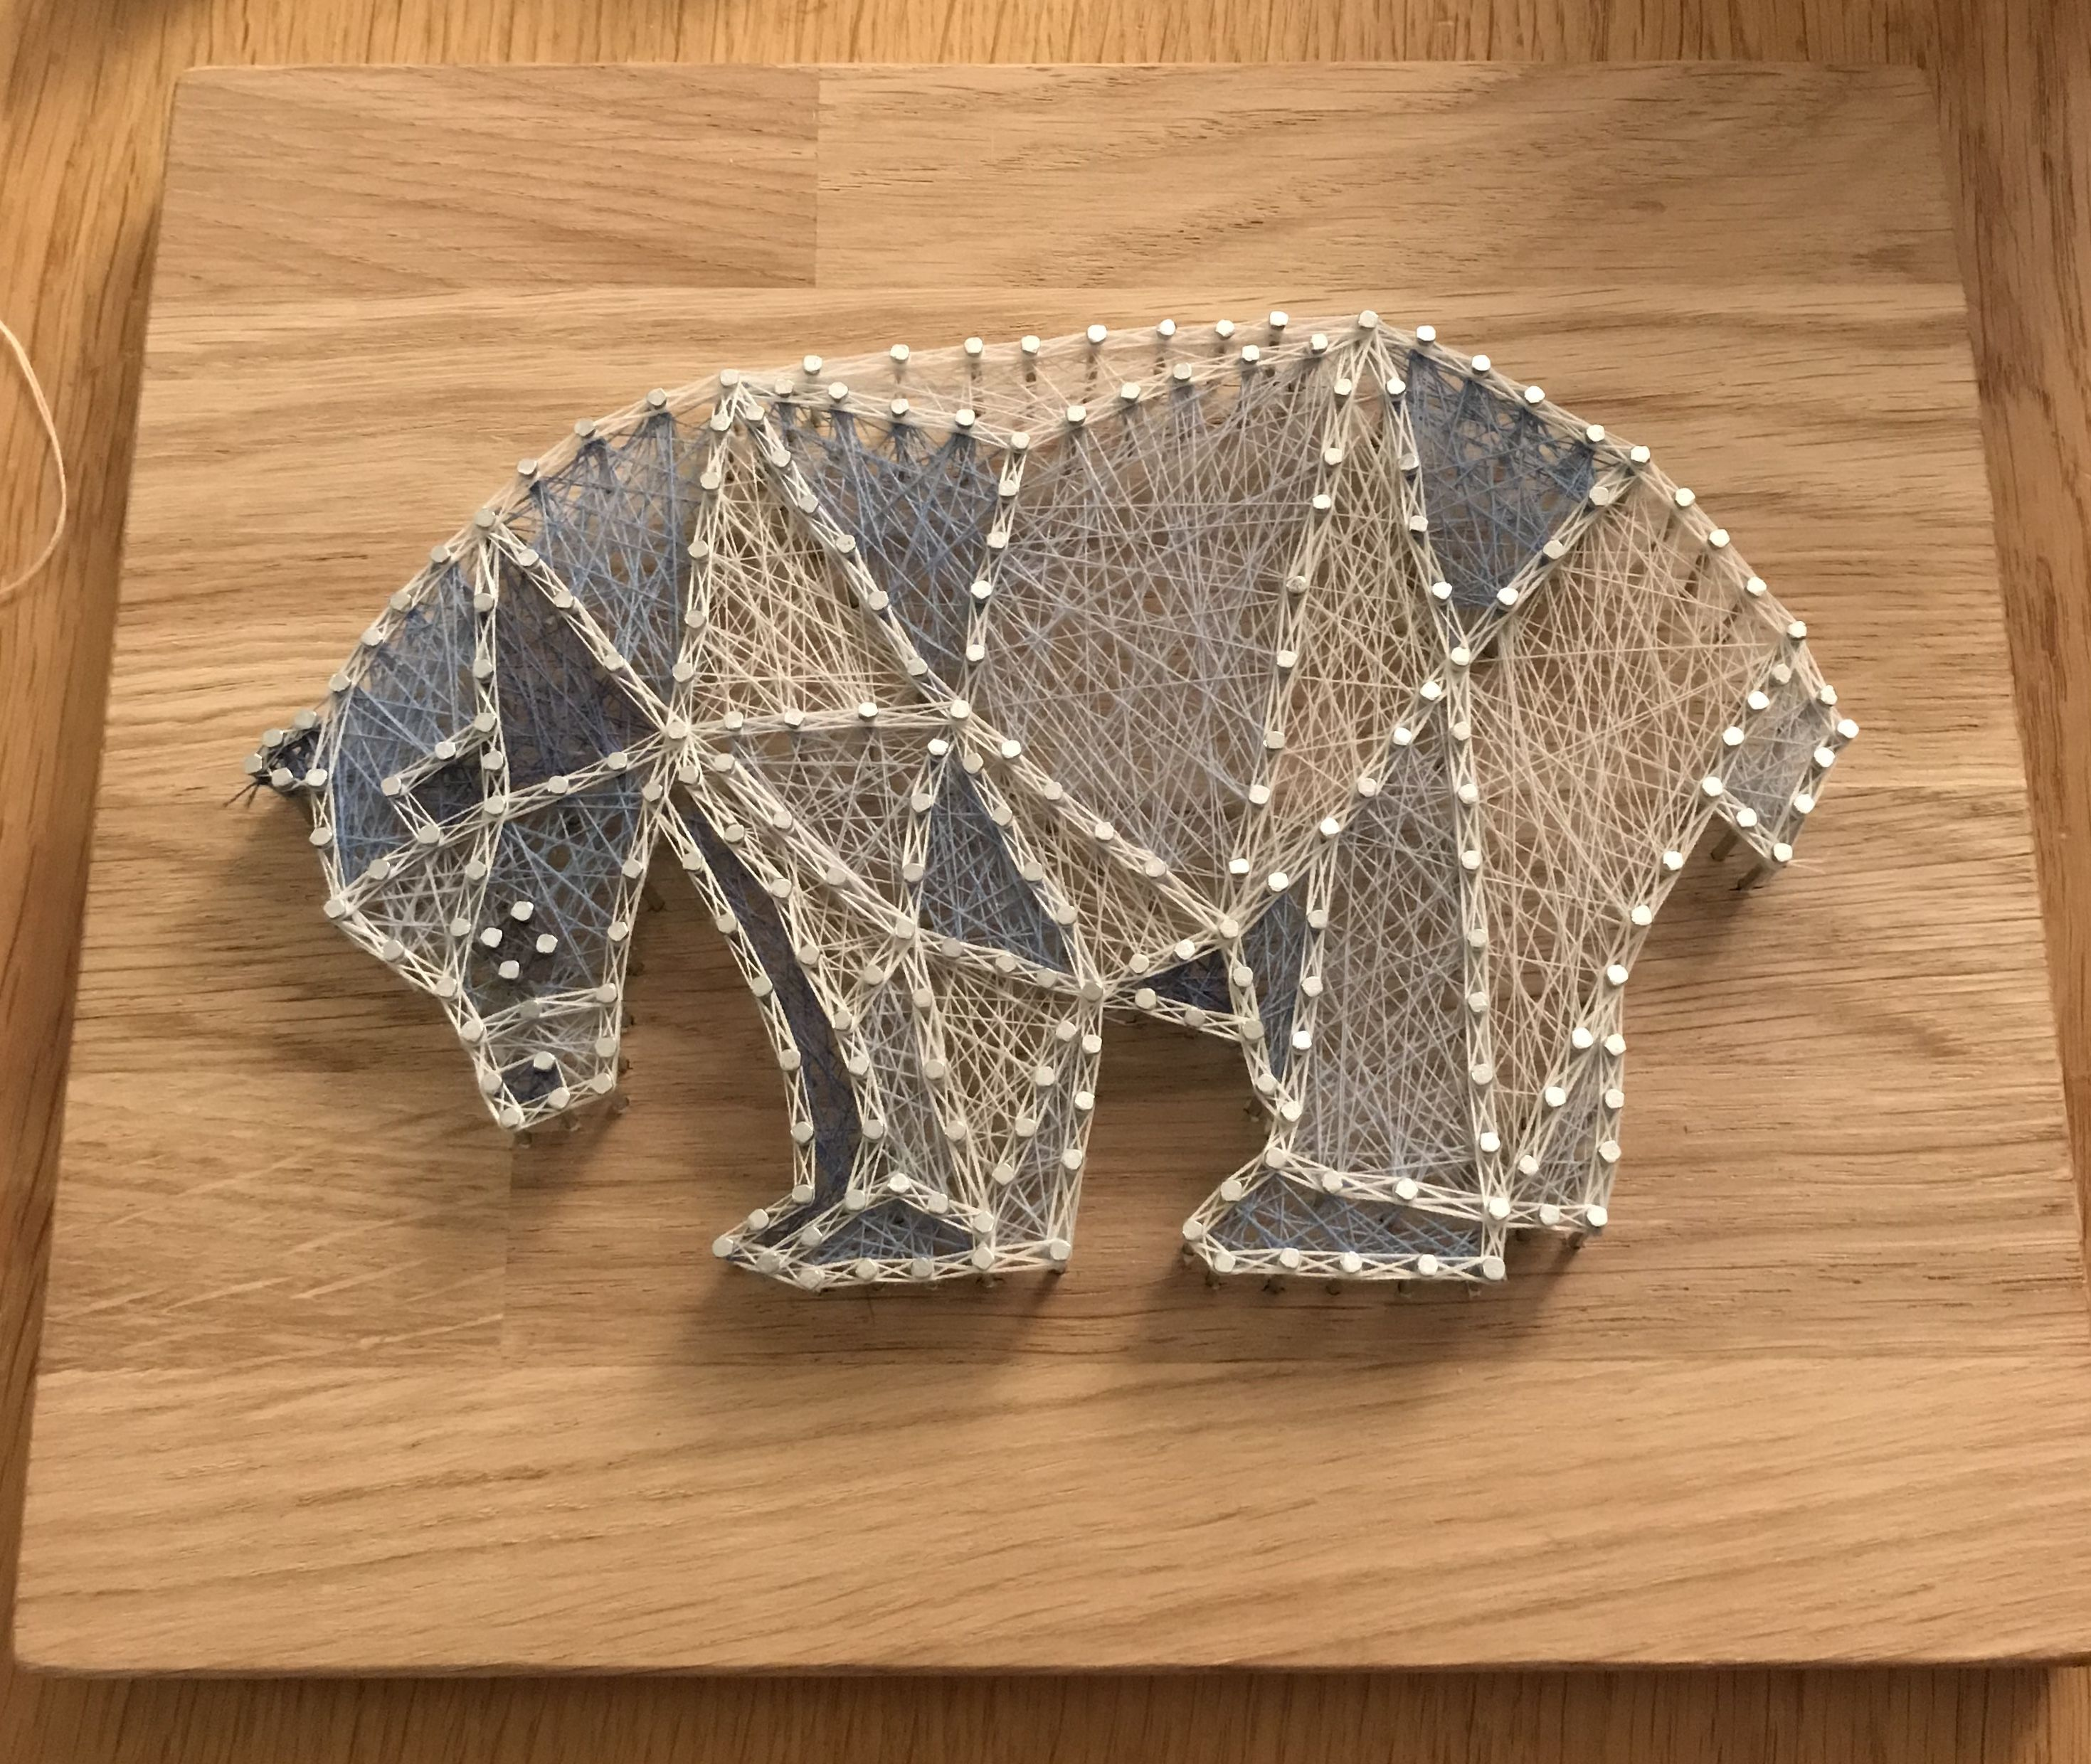 Pin On String Art Inspirastion